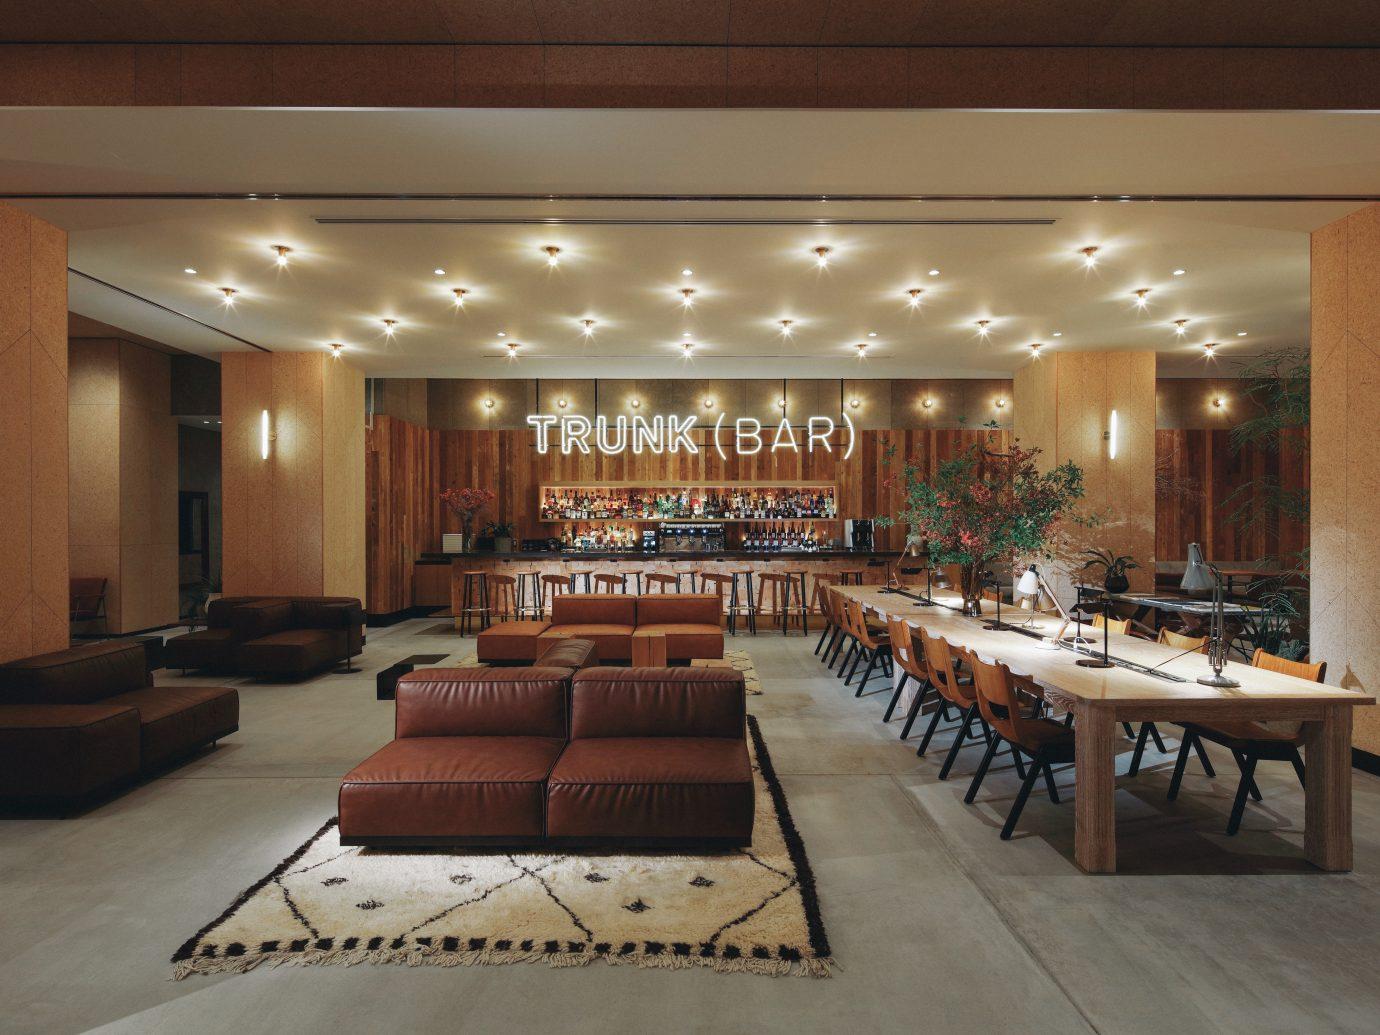 Bar area at the Trunk Hotel in Shibuya